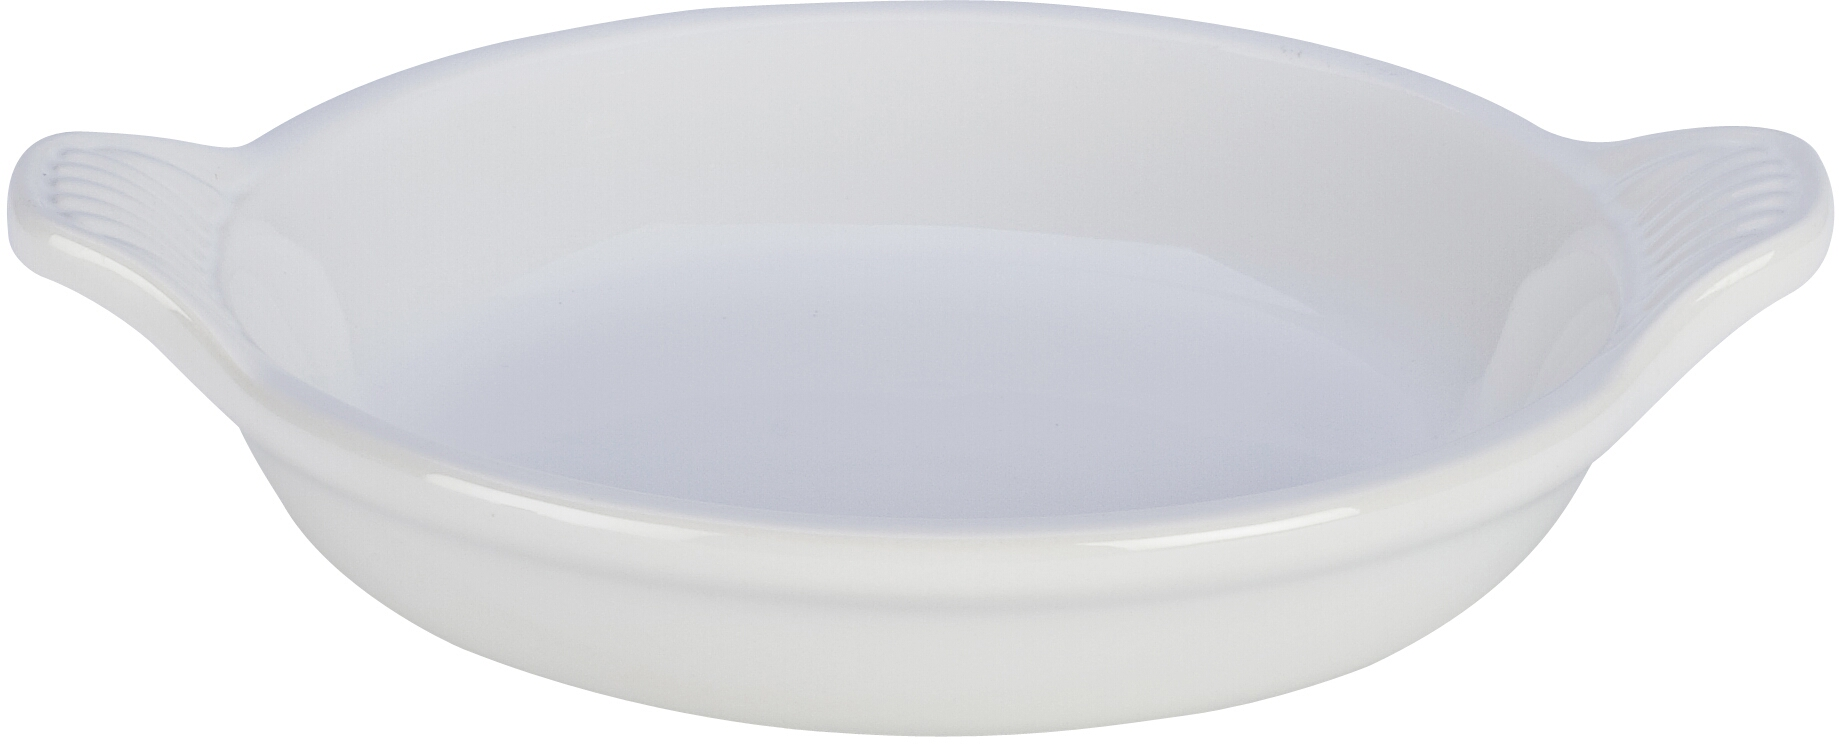 Le Creuset White Stoneware Creme Brulee Dish, 7 Ounce